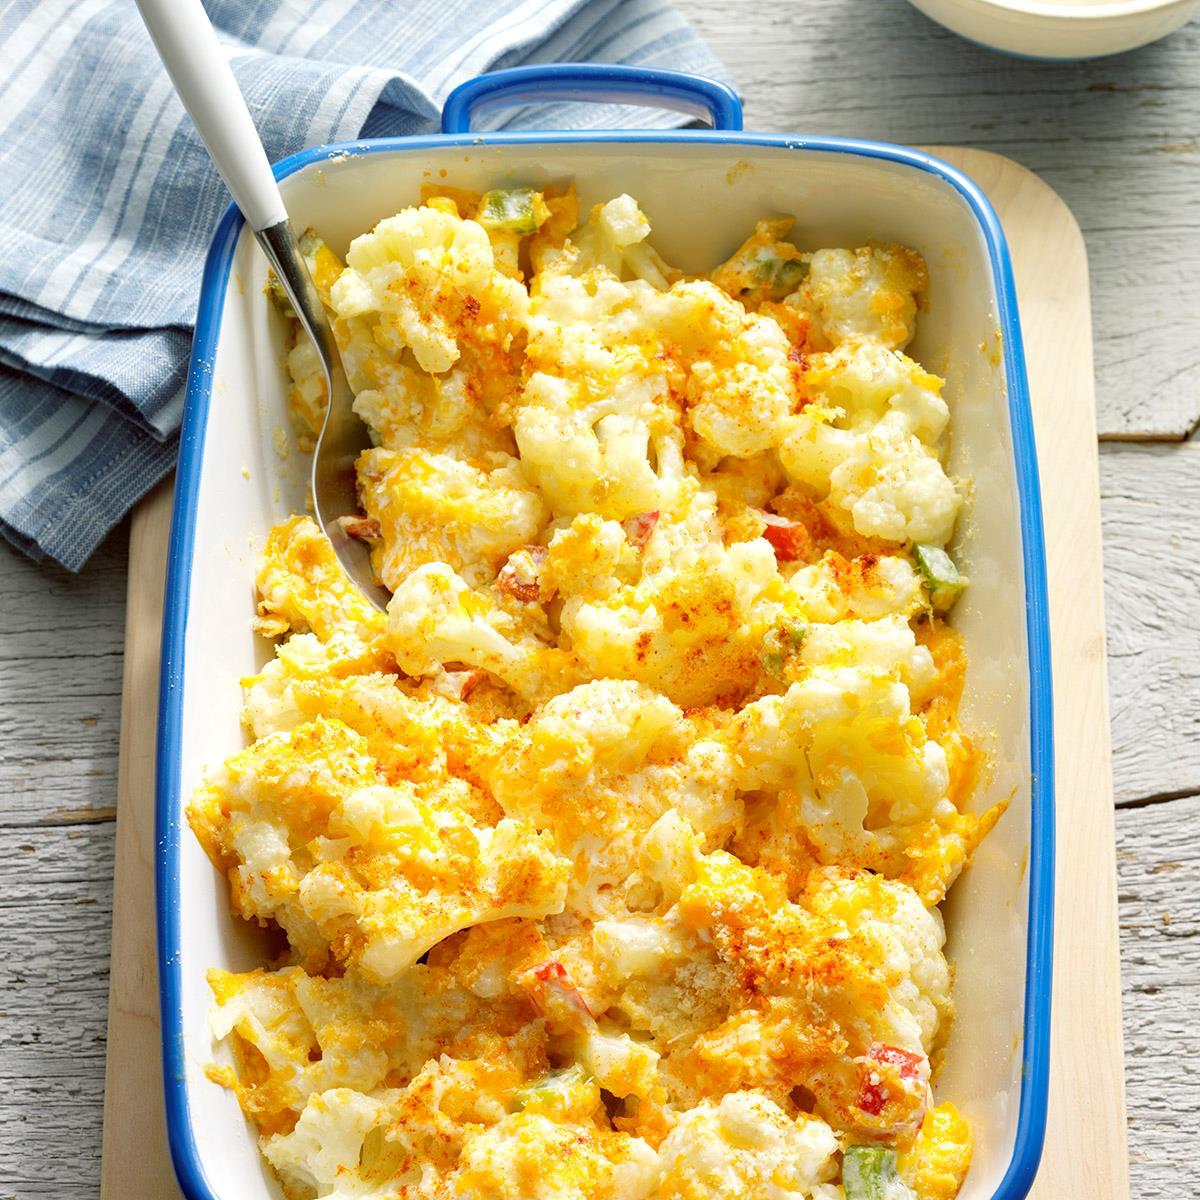 Napravite karfiol sa sirom